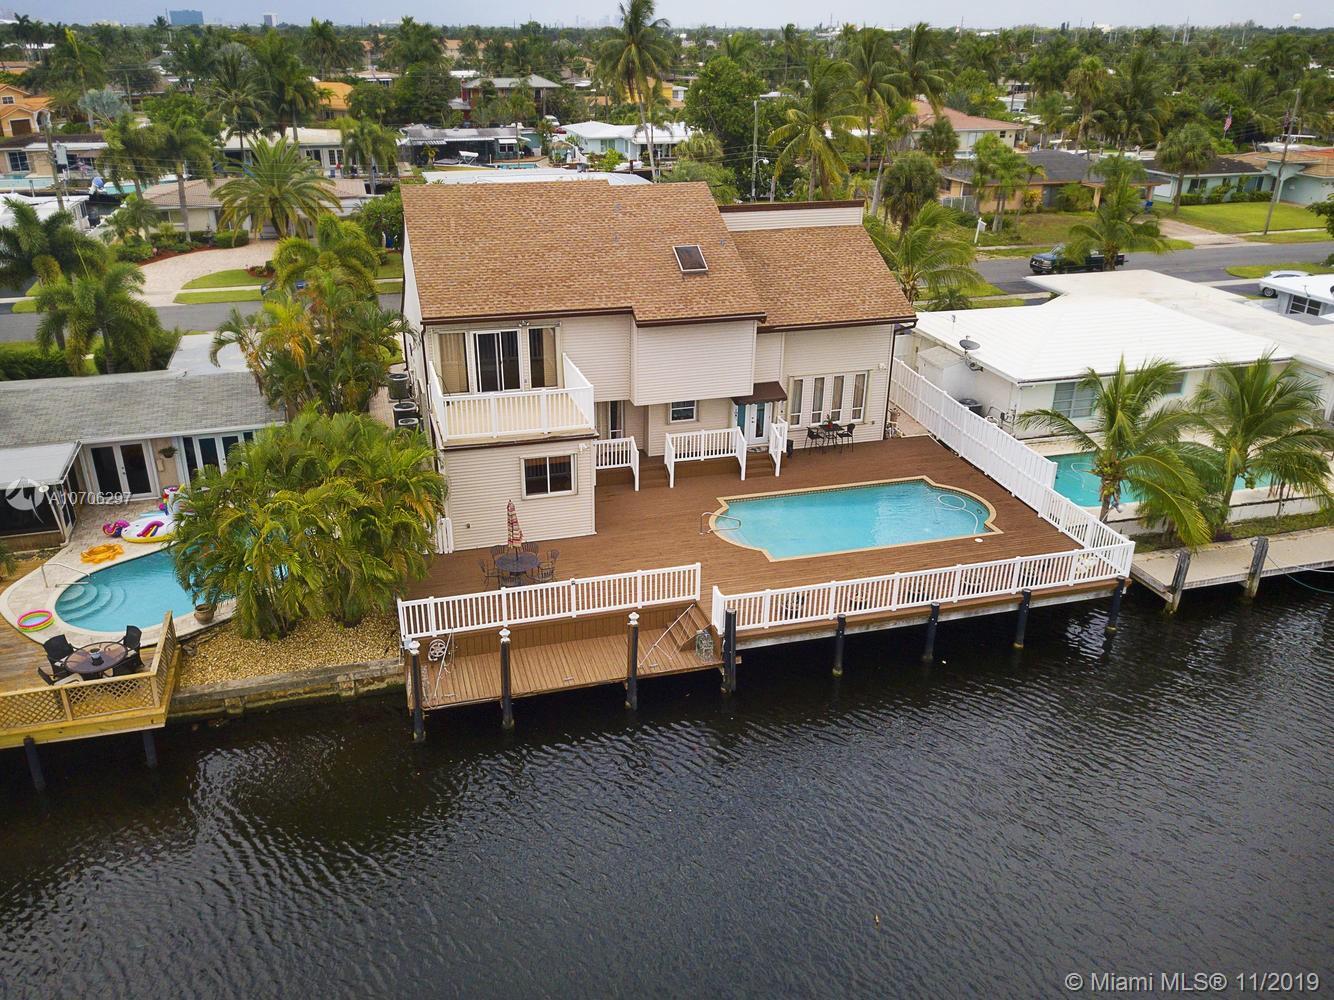 281 SE 11th St, Pompano Beach, FL 33060